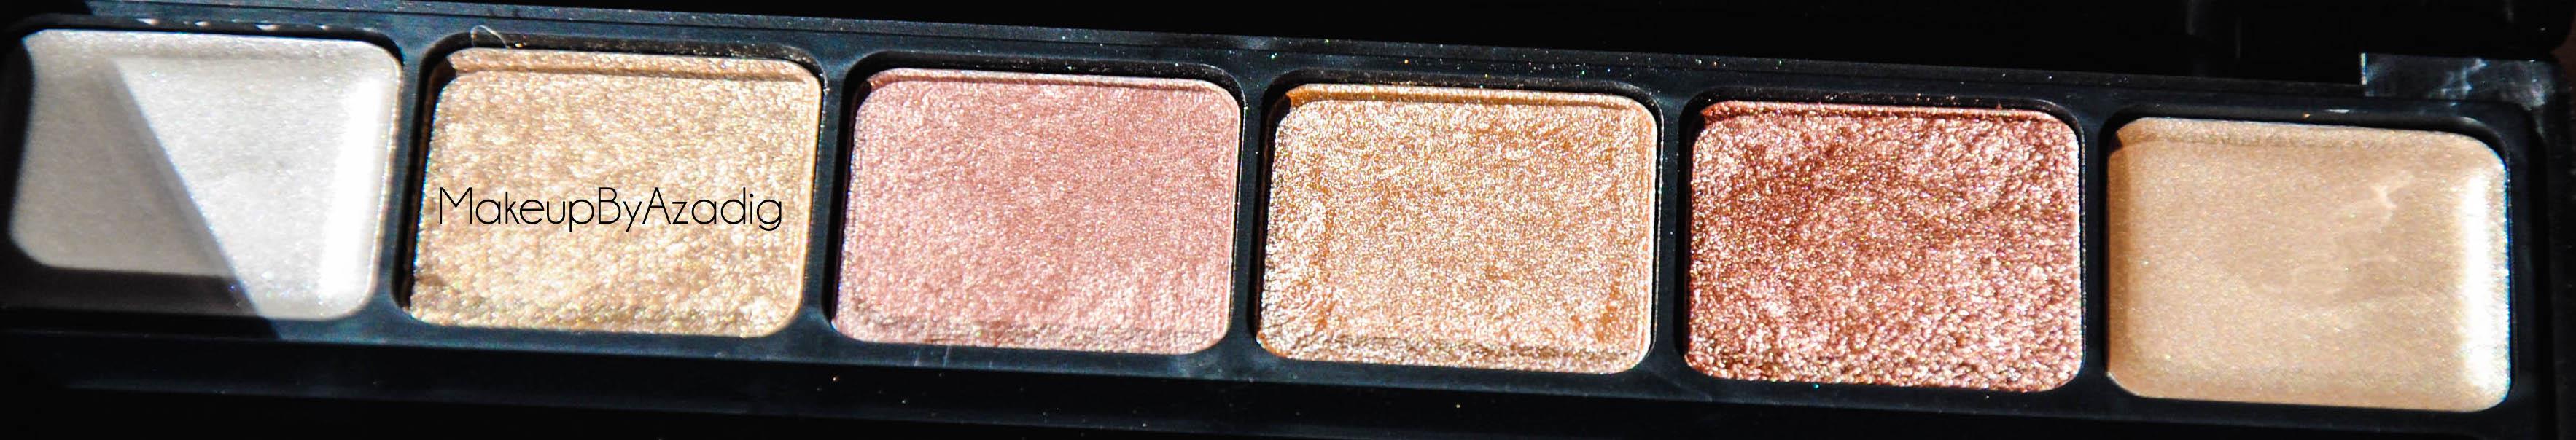 palette-eyeshadow-sleek-makeup-diamonds-in-the-rough-ilust-sephora-paris-makeupbyazadig-noel-code-promo-avis-prix-sun